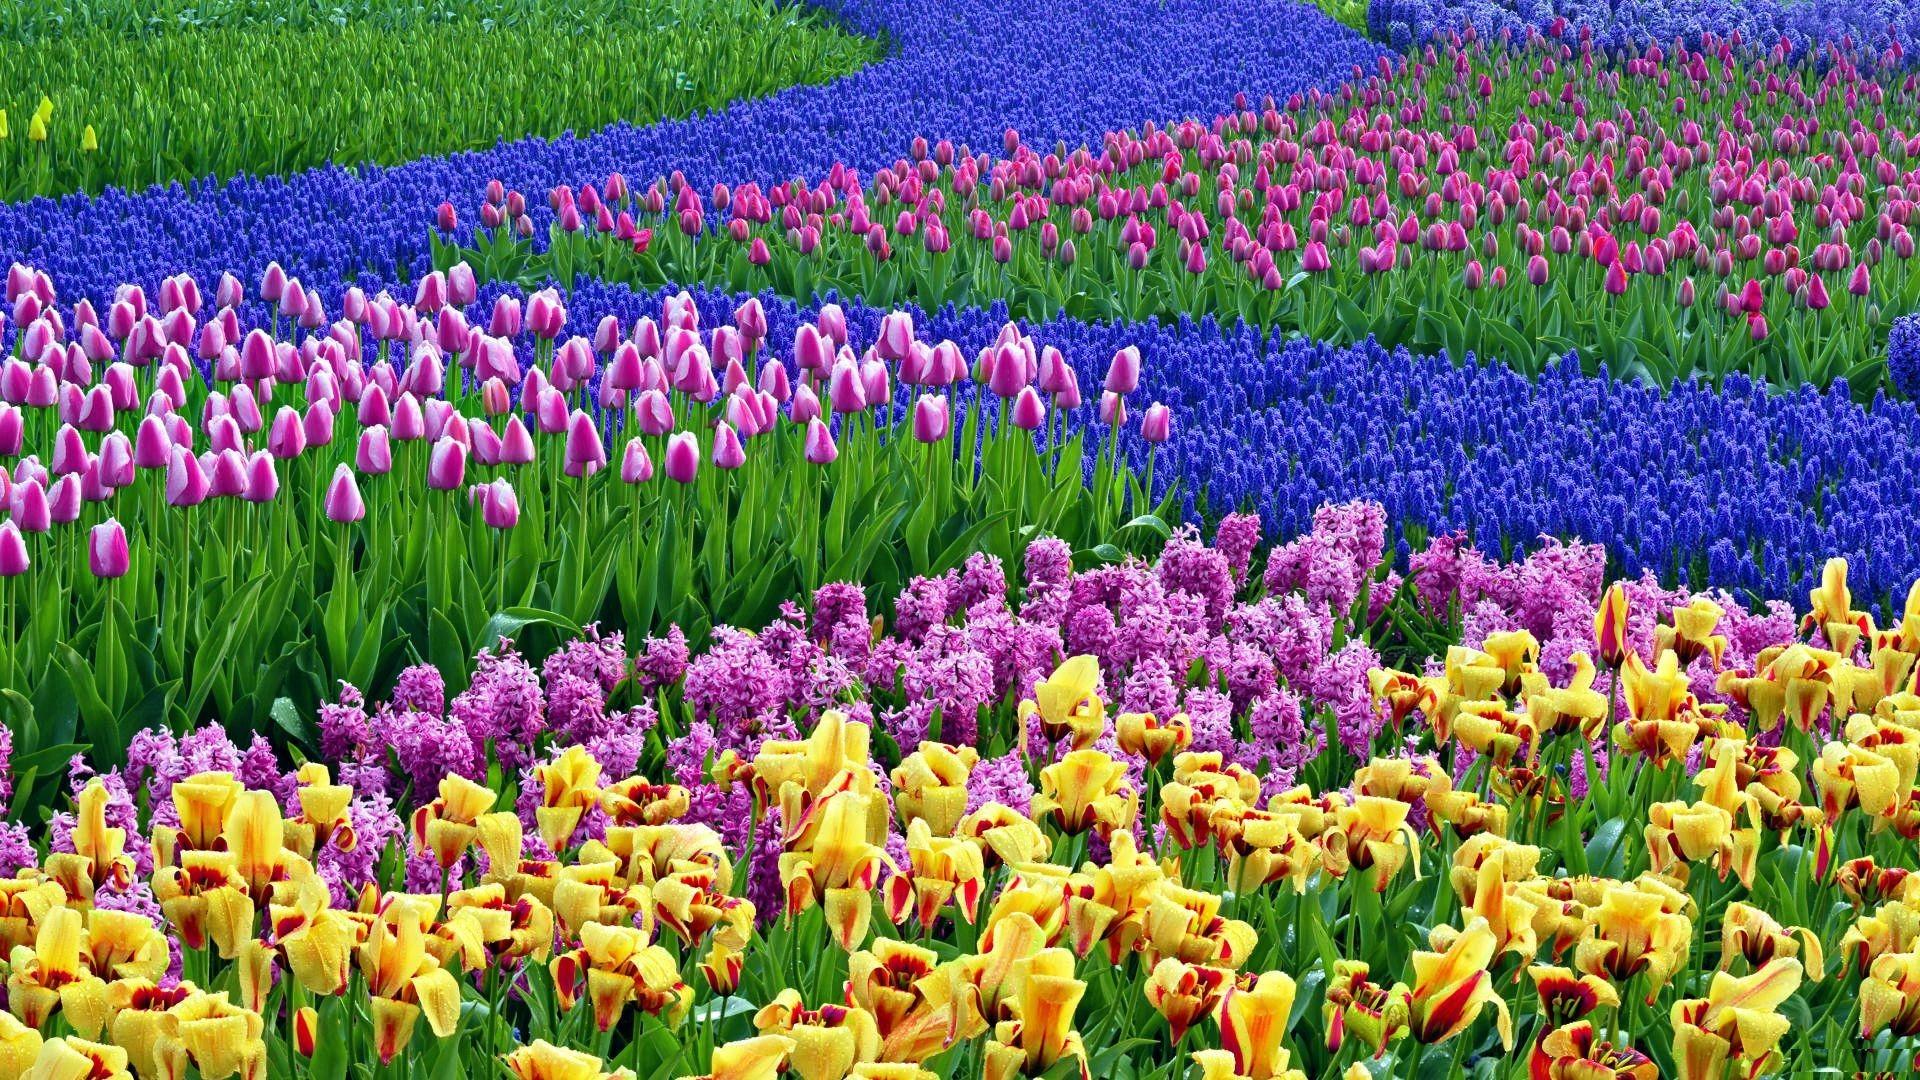 The 25 Best Flower Desktop Wallpaper Ideas On Pinterest - Spring Flower Desktop Background - HD Wallpaper